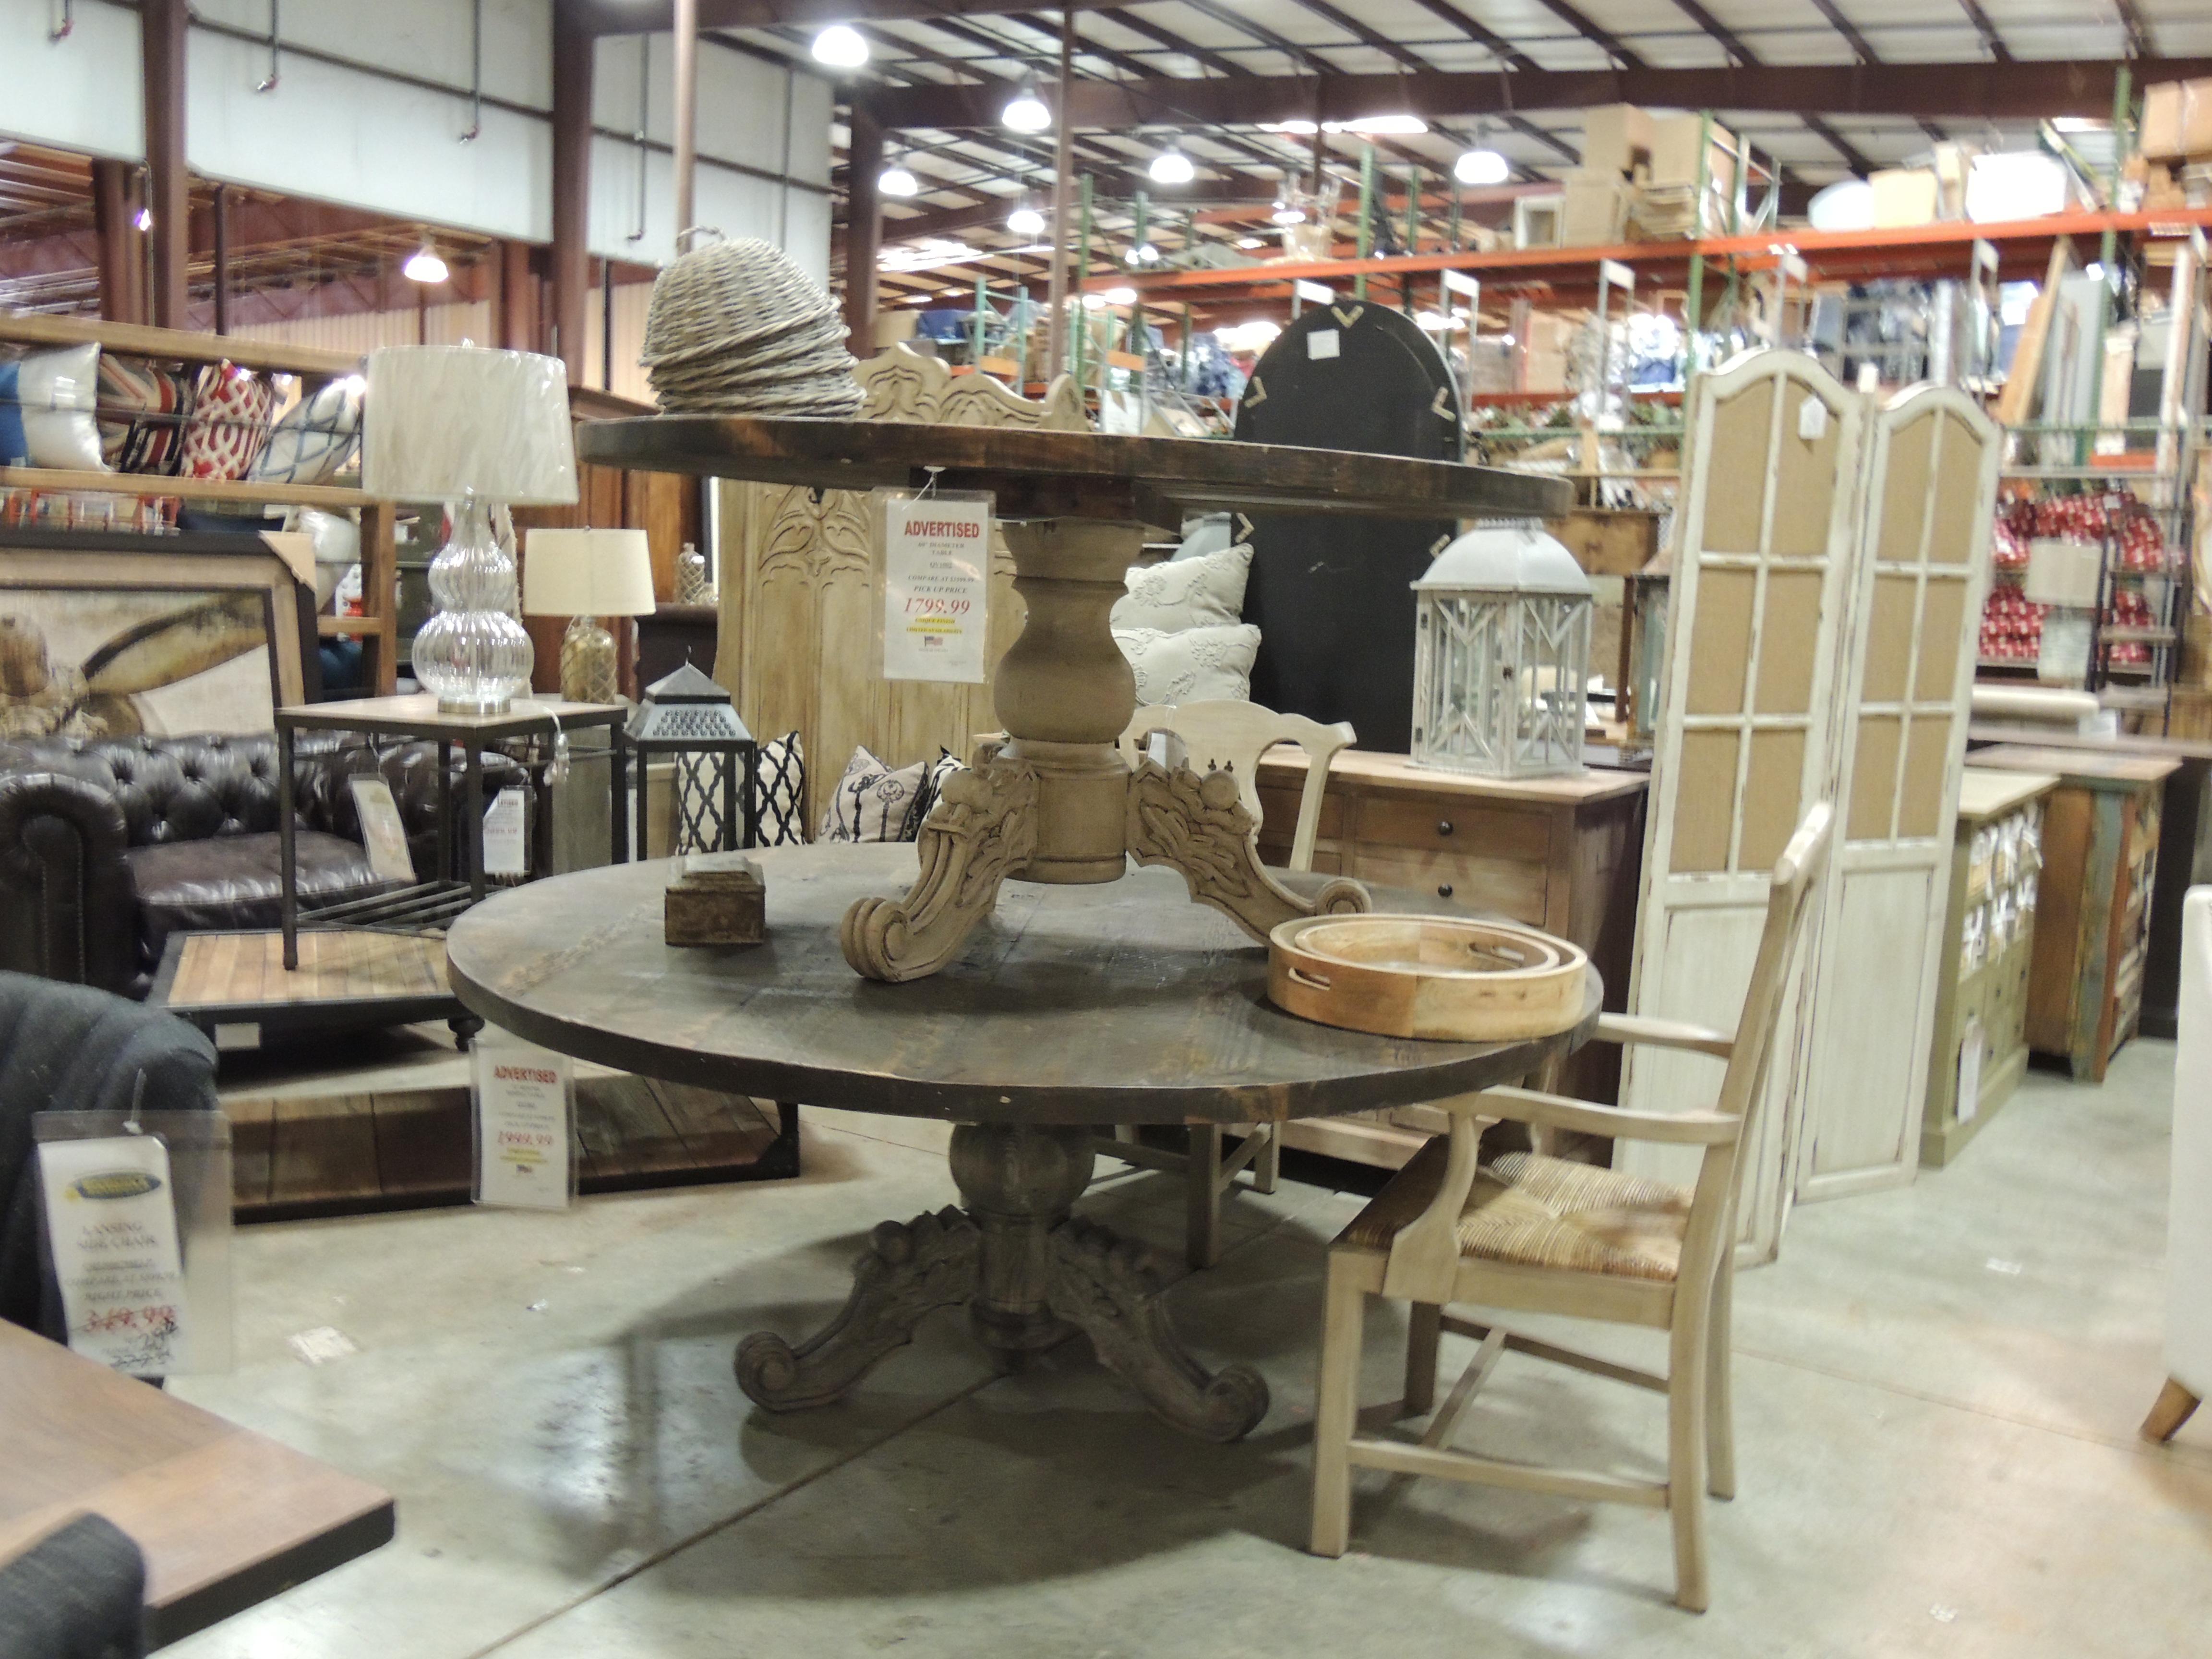 Wfo Woodstock Furniture Outlet